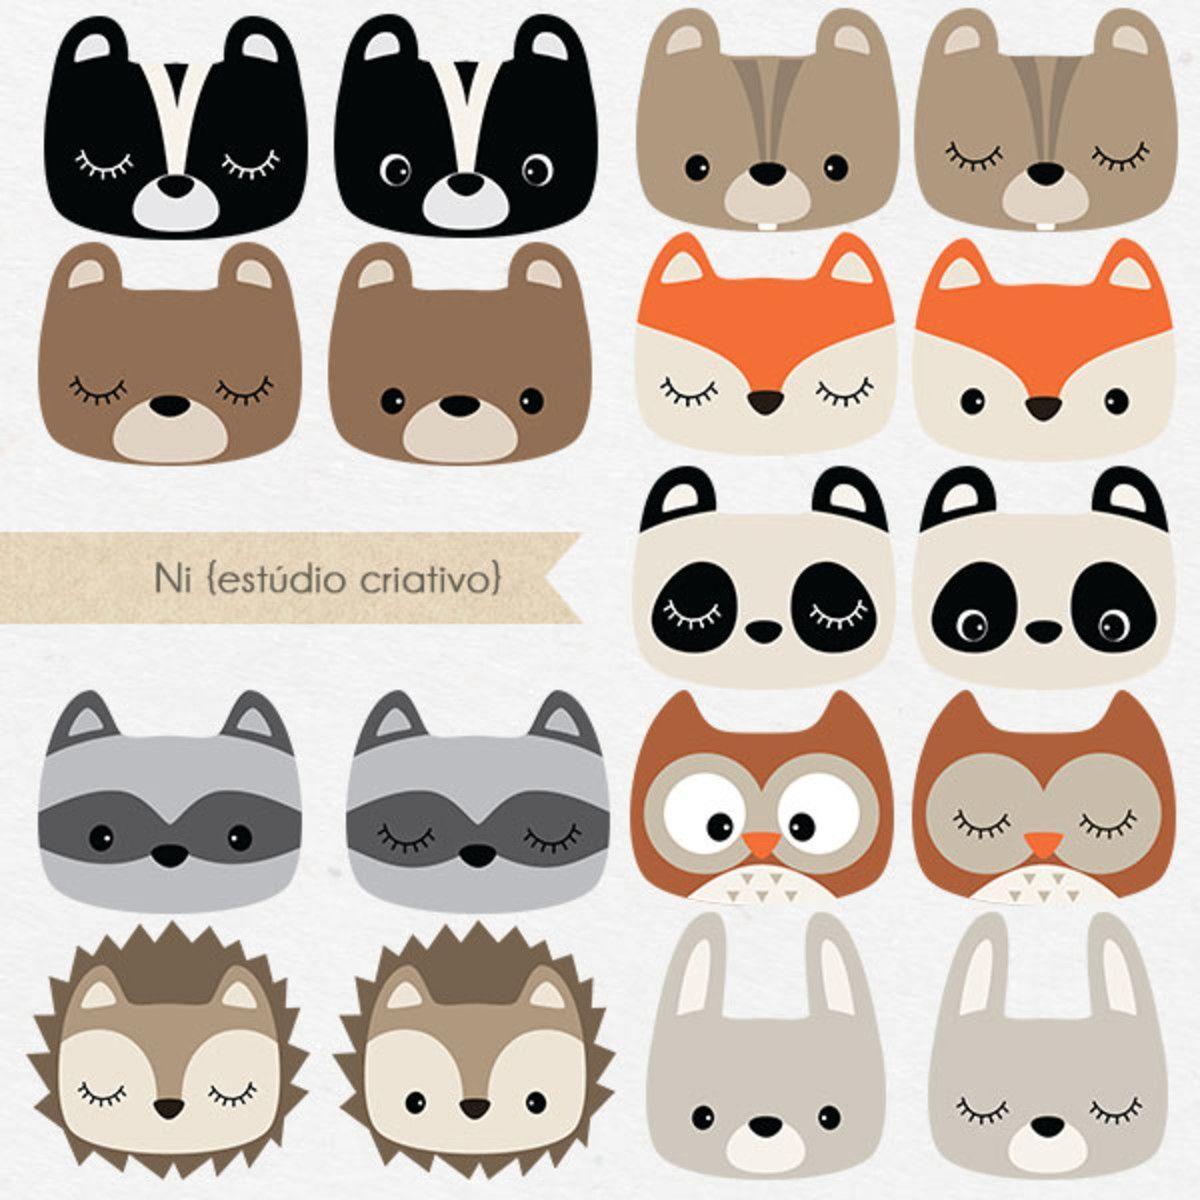 Kit Scrapbook Cliparts Elementos Animais Do Bosque Floresta No Elo7 Megascrapss F64833 Animales Del Bosque Cumpleanos De Animales Habitacion Bebe Inspiracion Forestal